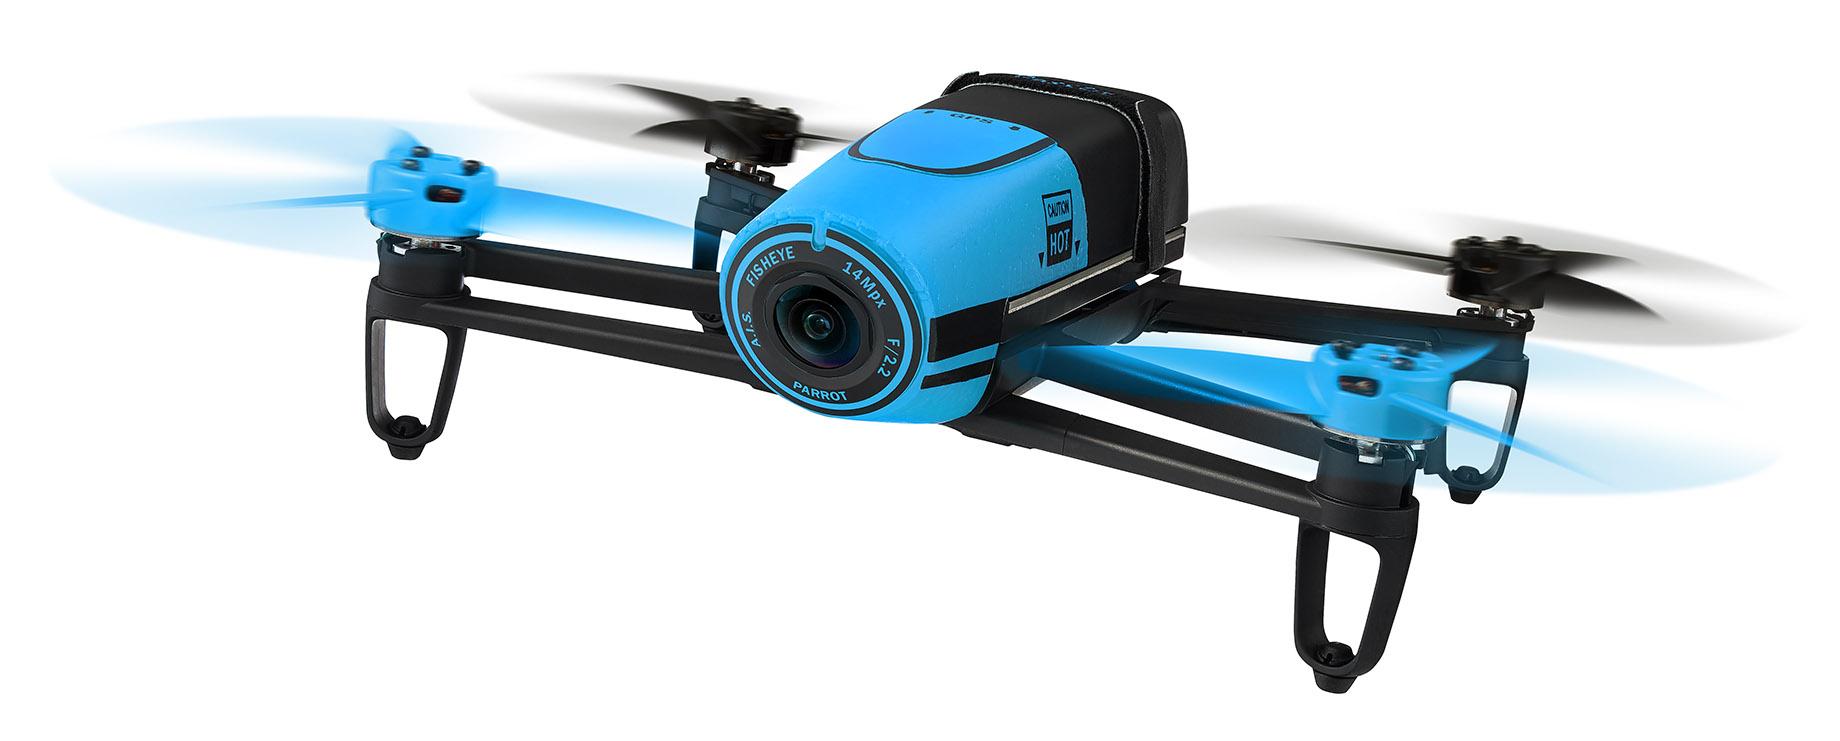 parrot-bebop-drone-new-05.jpg